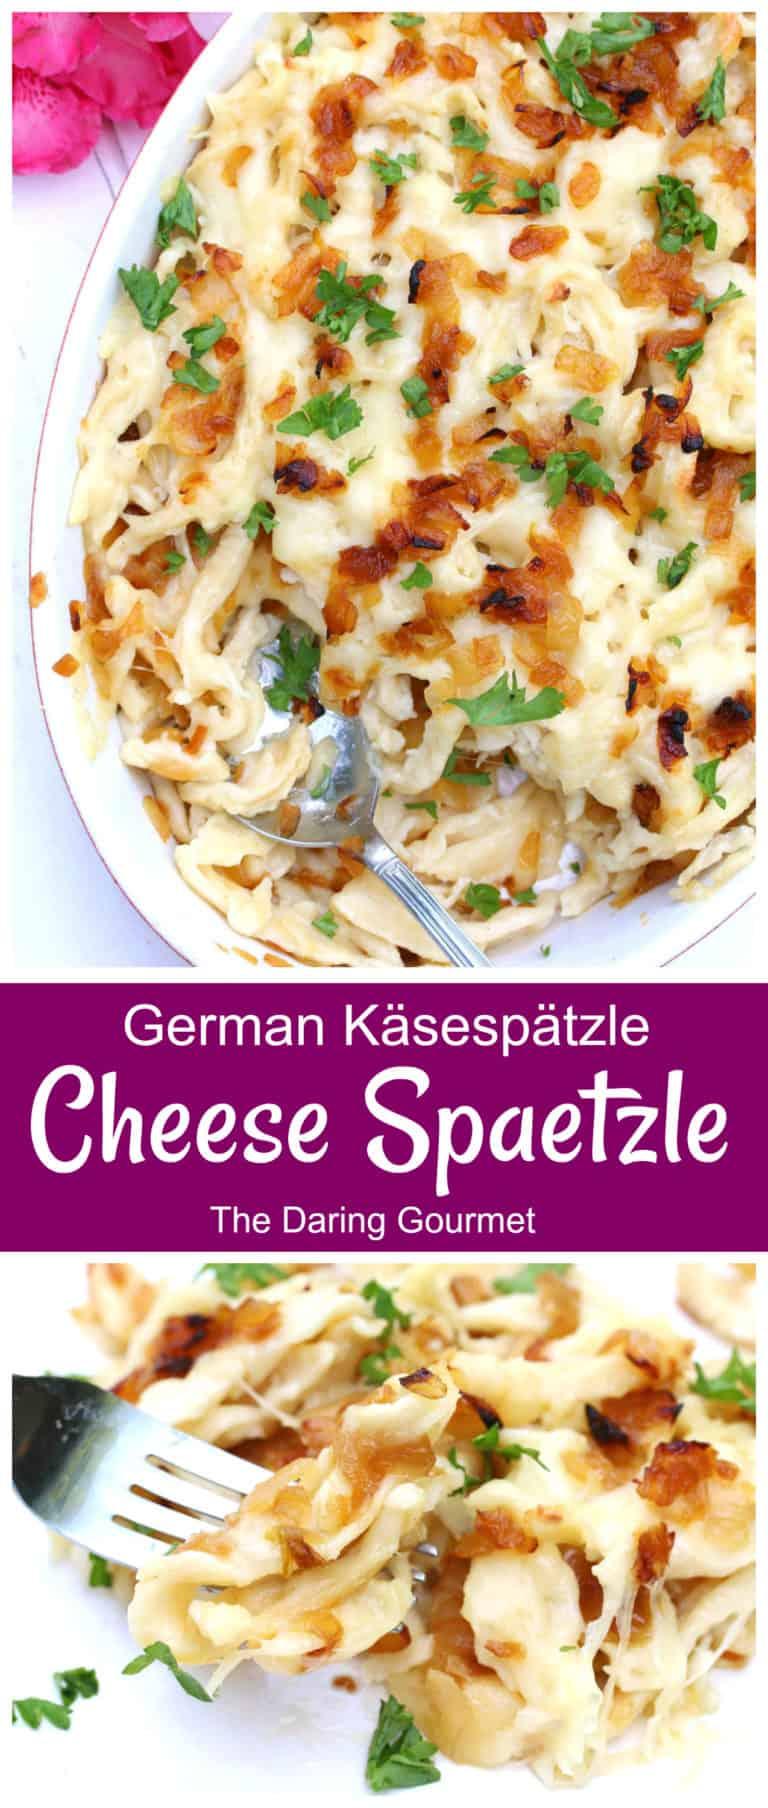 kasespatzle recipe authentic traditional cheese spaetzle